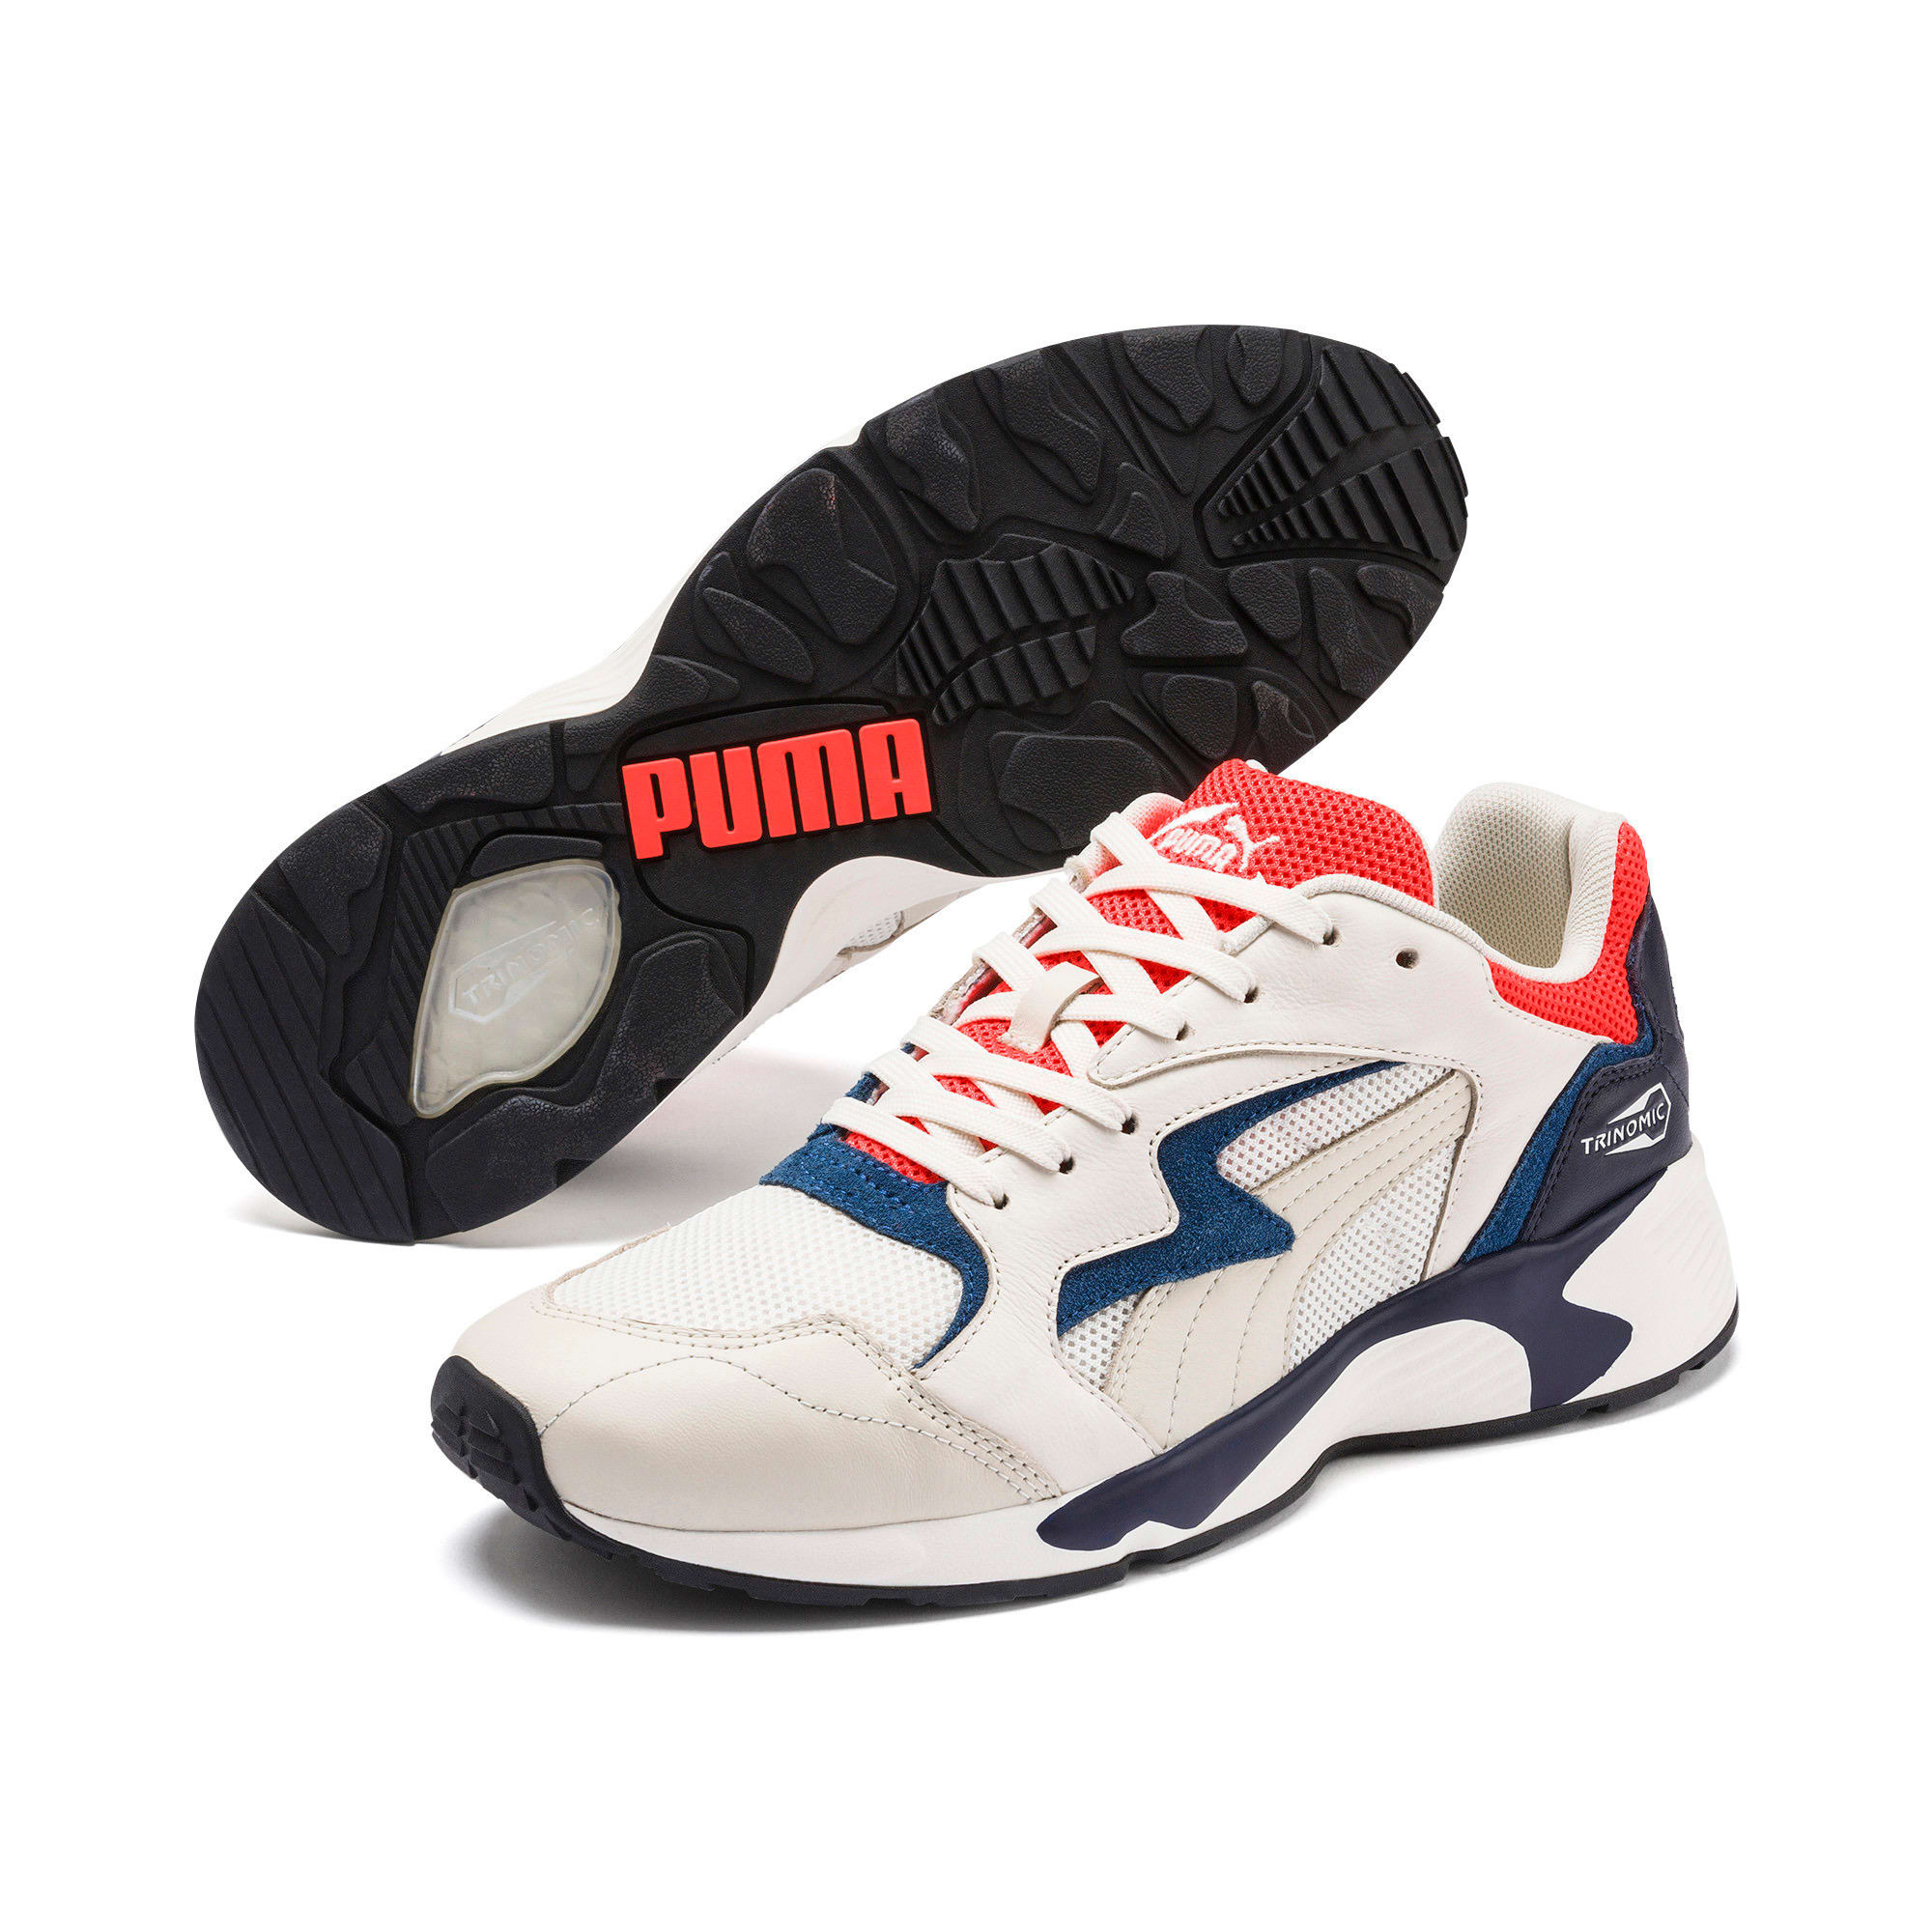 Thumbnail 2 of Prevail Classic Sneakers, Whisper White-Nrgy Red, medium